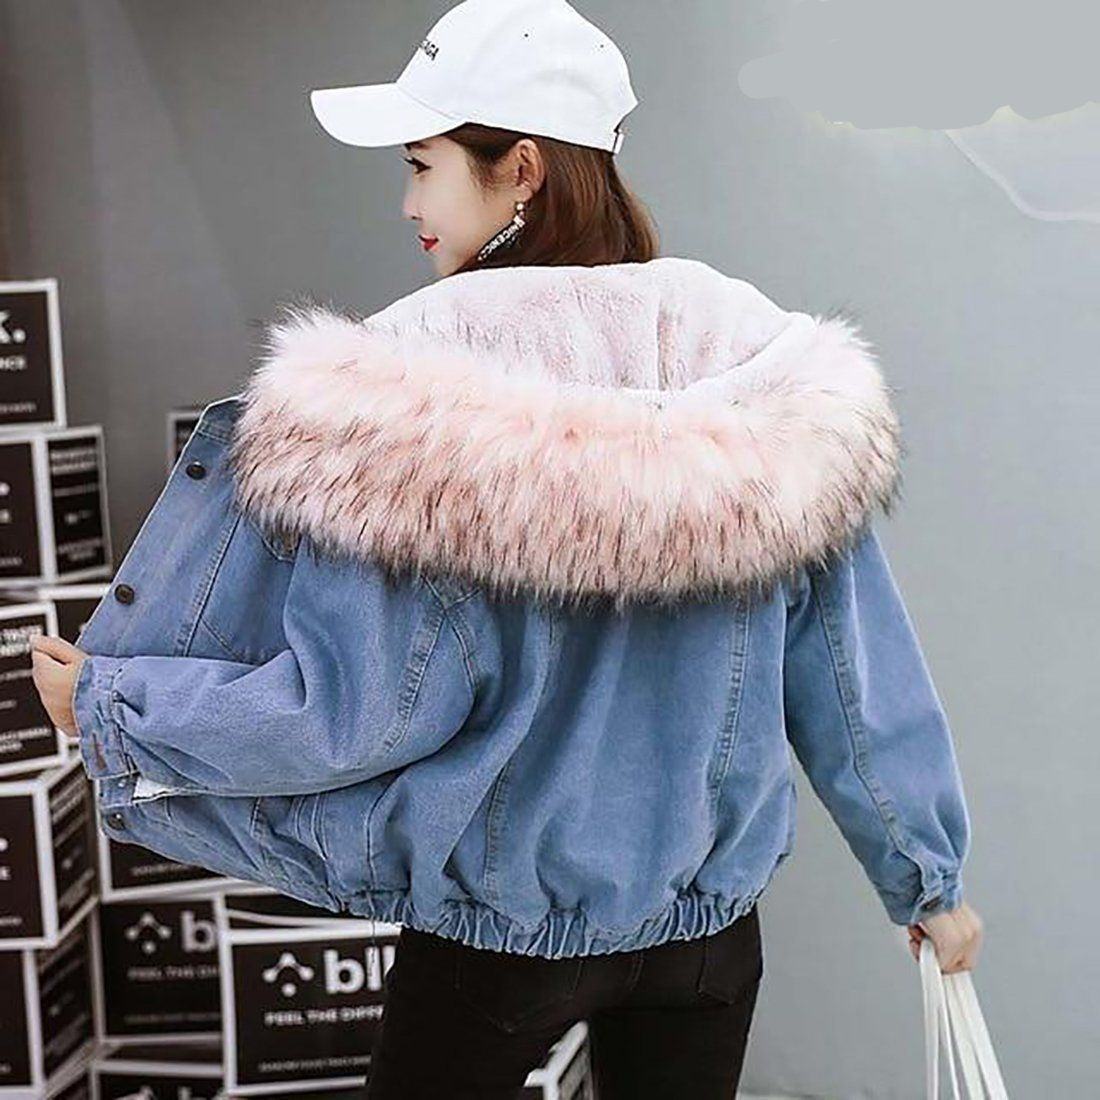 Women S Coat Warm Hooded Jean Denim Thick Basic Windbreaker For Winter Spring Autumn Pink Fur S Denim Jacket With Fur Denim Jacket Women Hooded Denim Jacket [ 1100 x 1100 Pixel ]